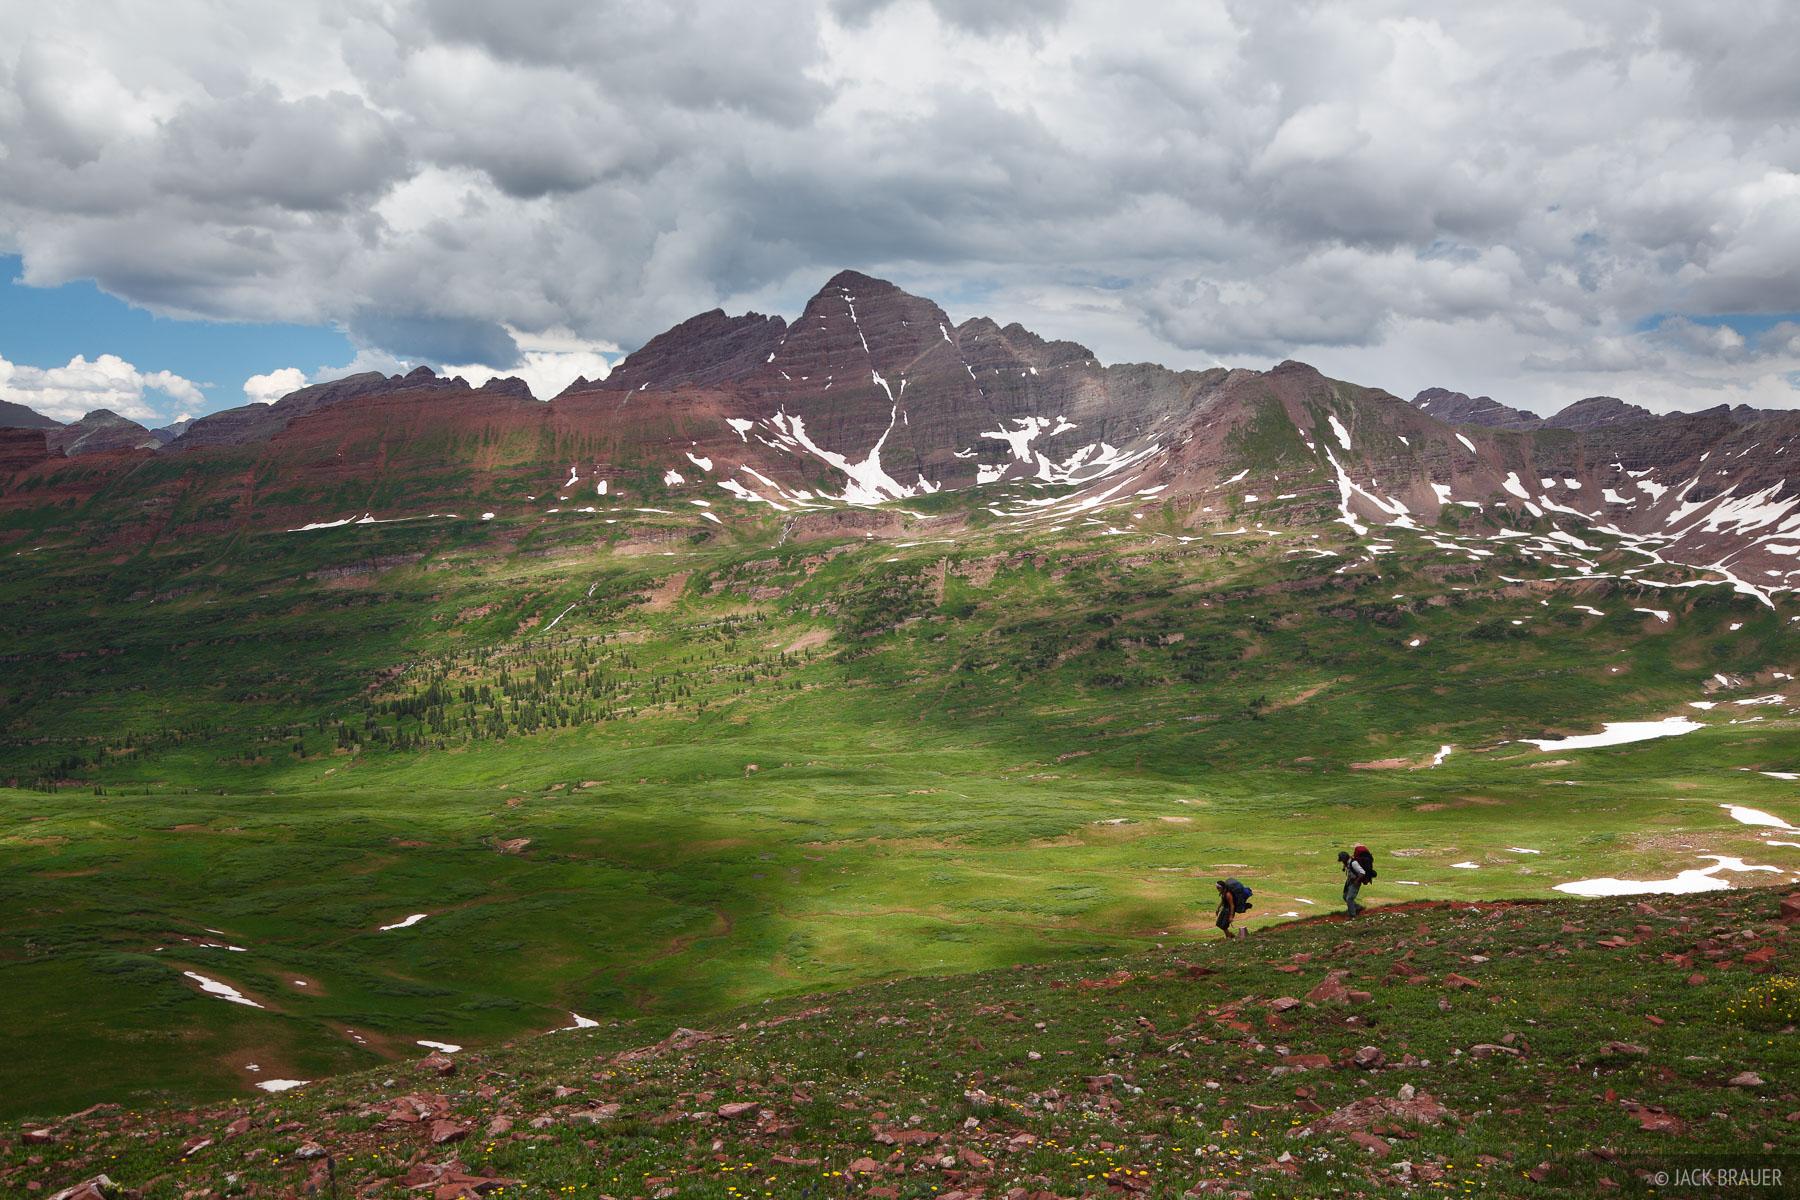 Frigid Air Pass, Maroon Bells, Elk Mountains, Colorado, hikers, Fravert Basin, Maroon Bells-Snowmass Wilderness, photo